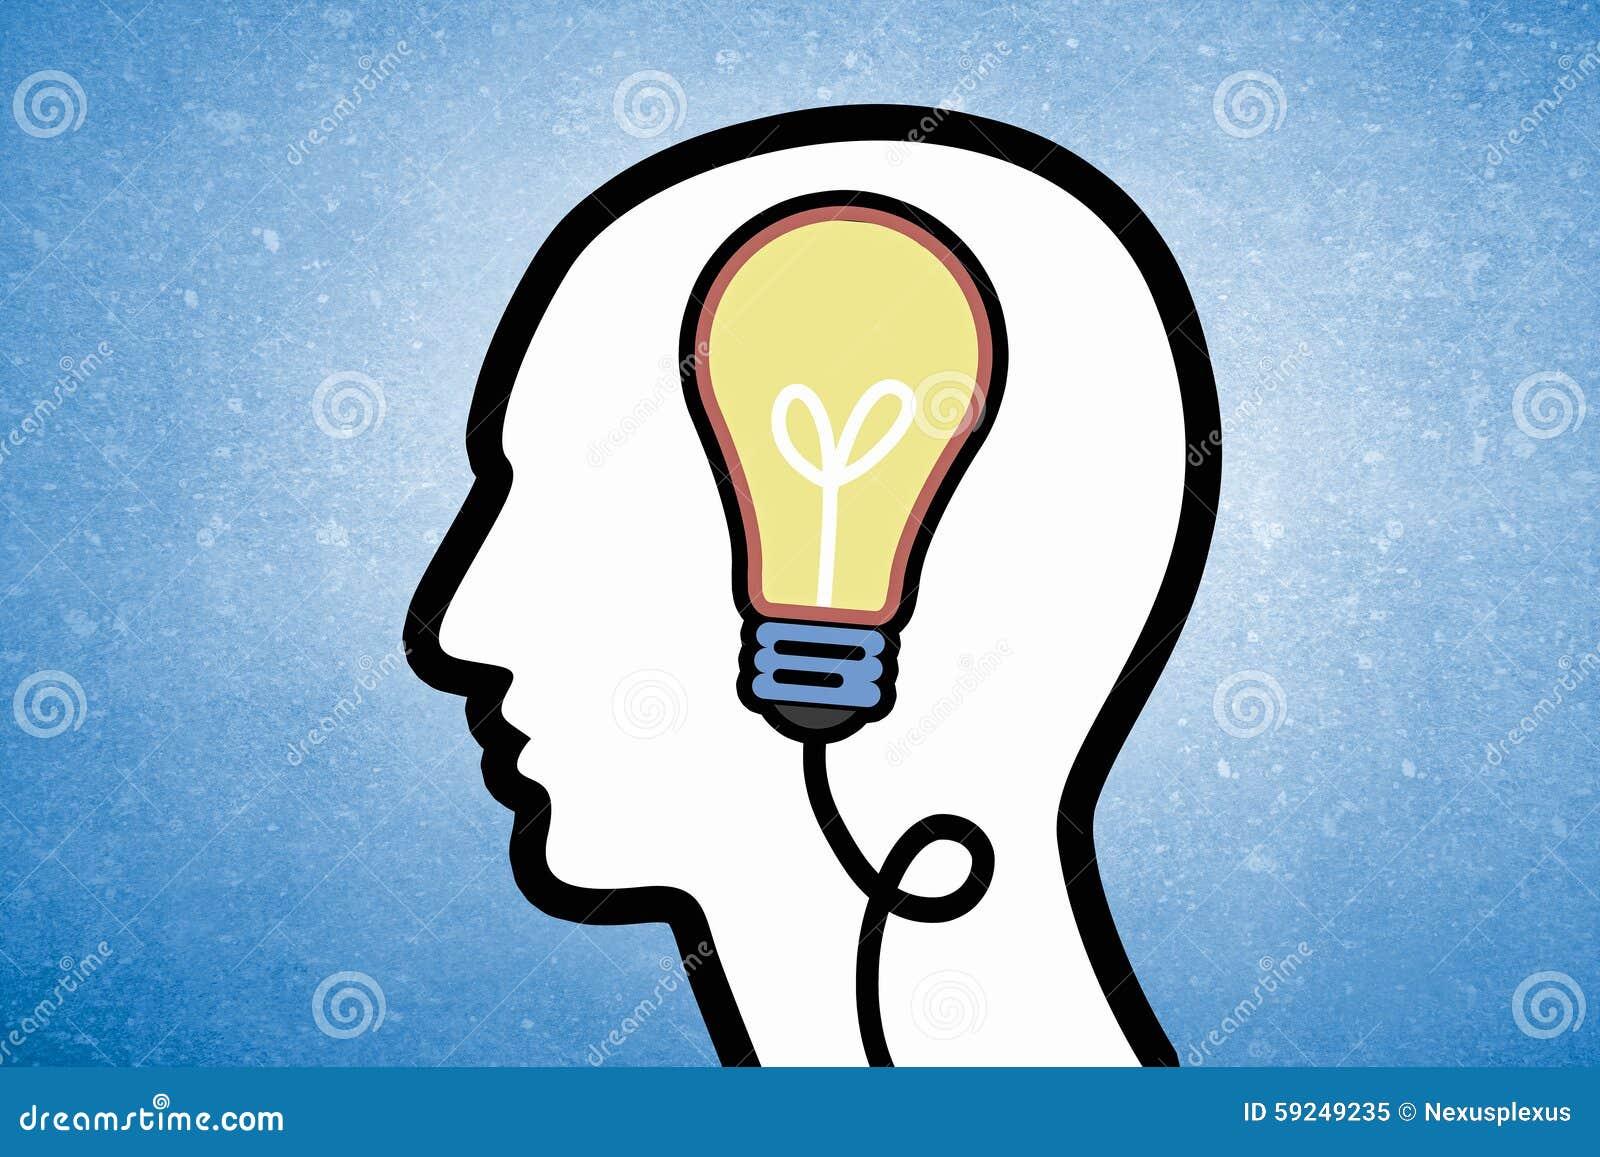 Mecanismo de pensamiento